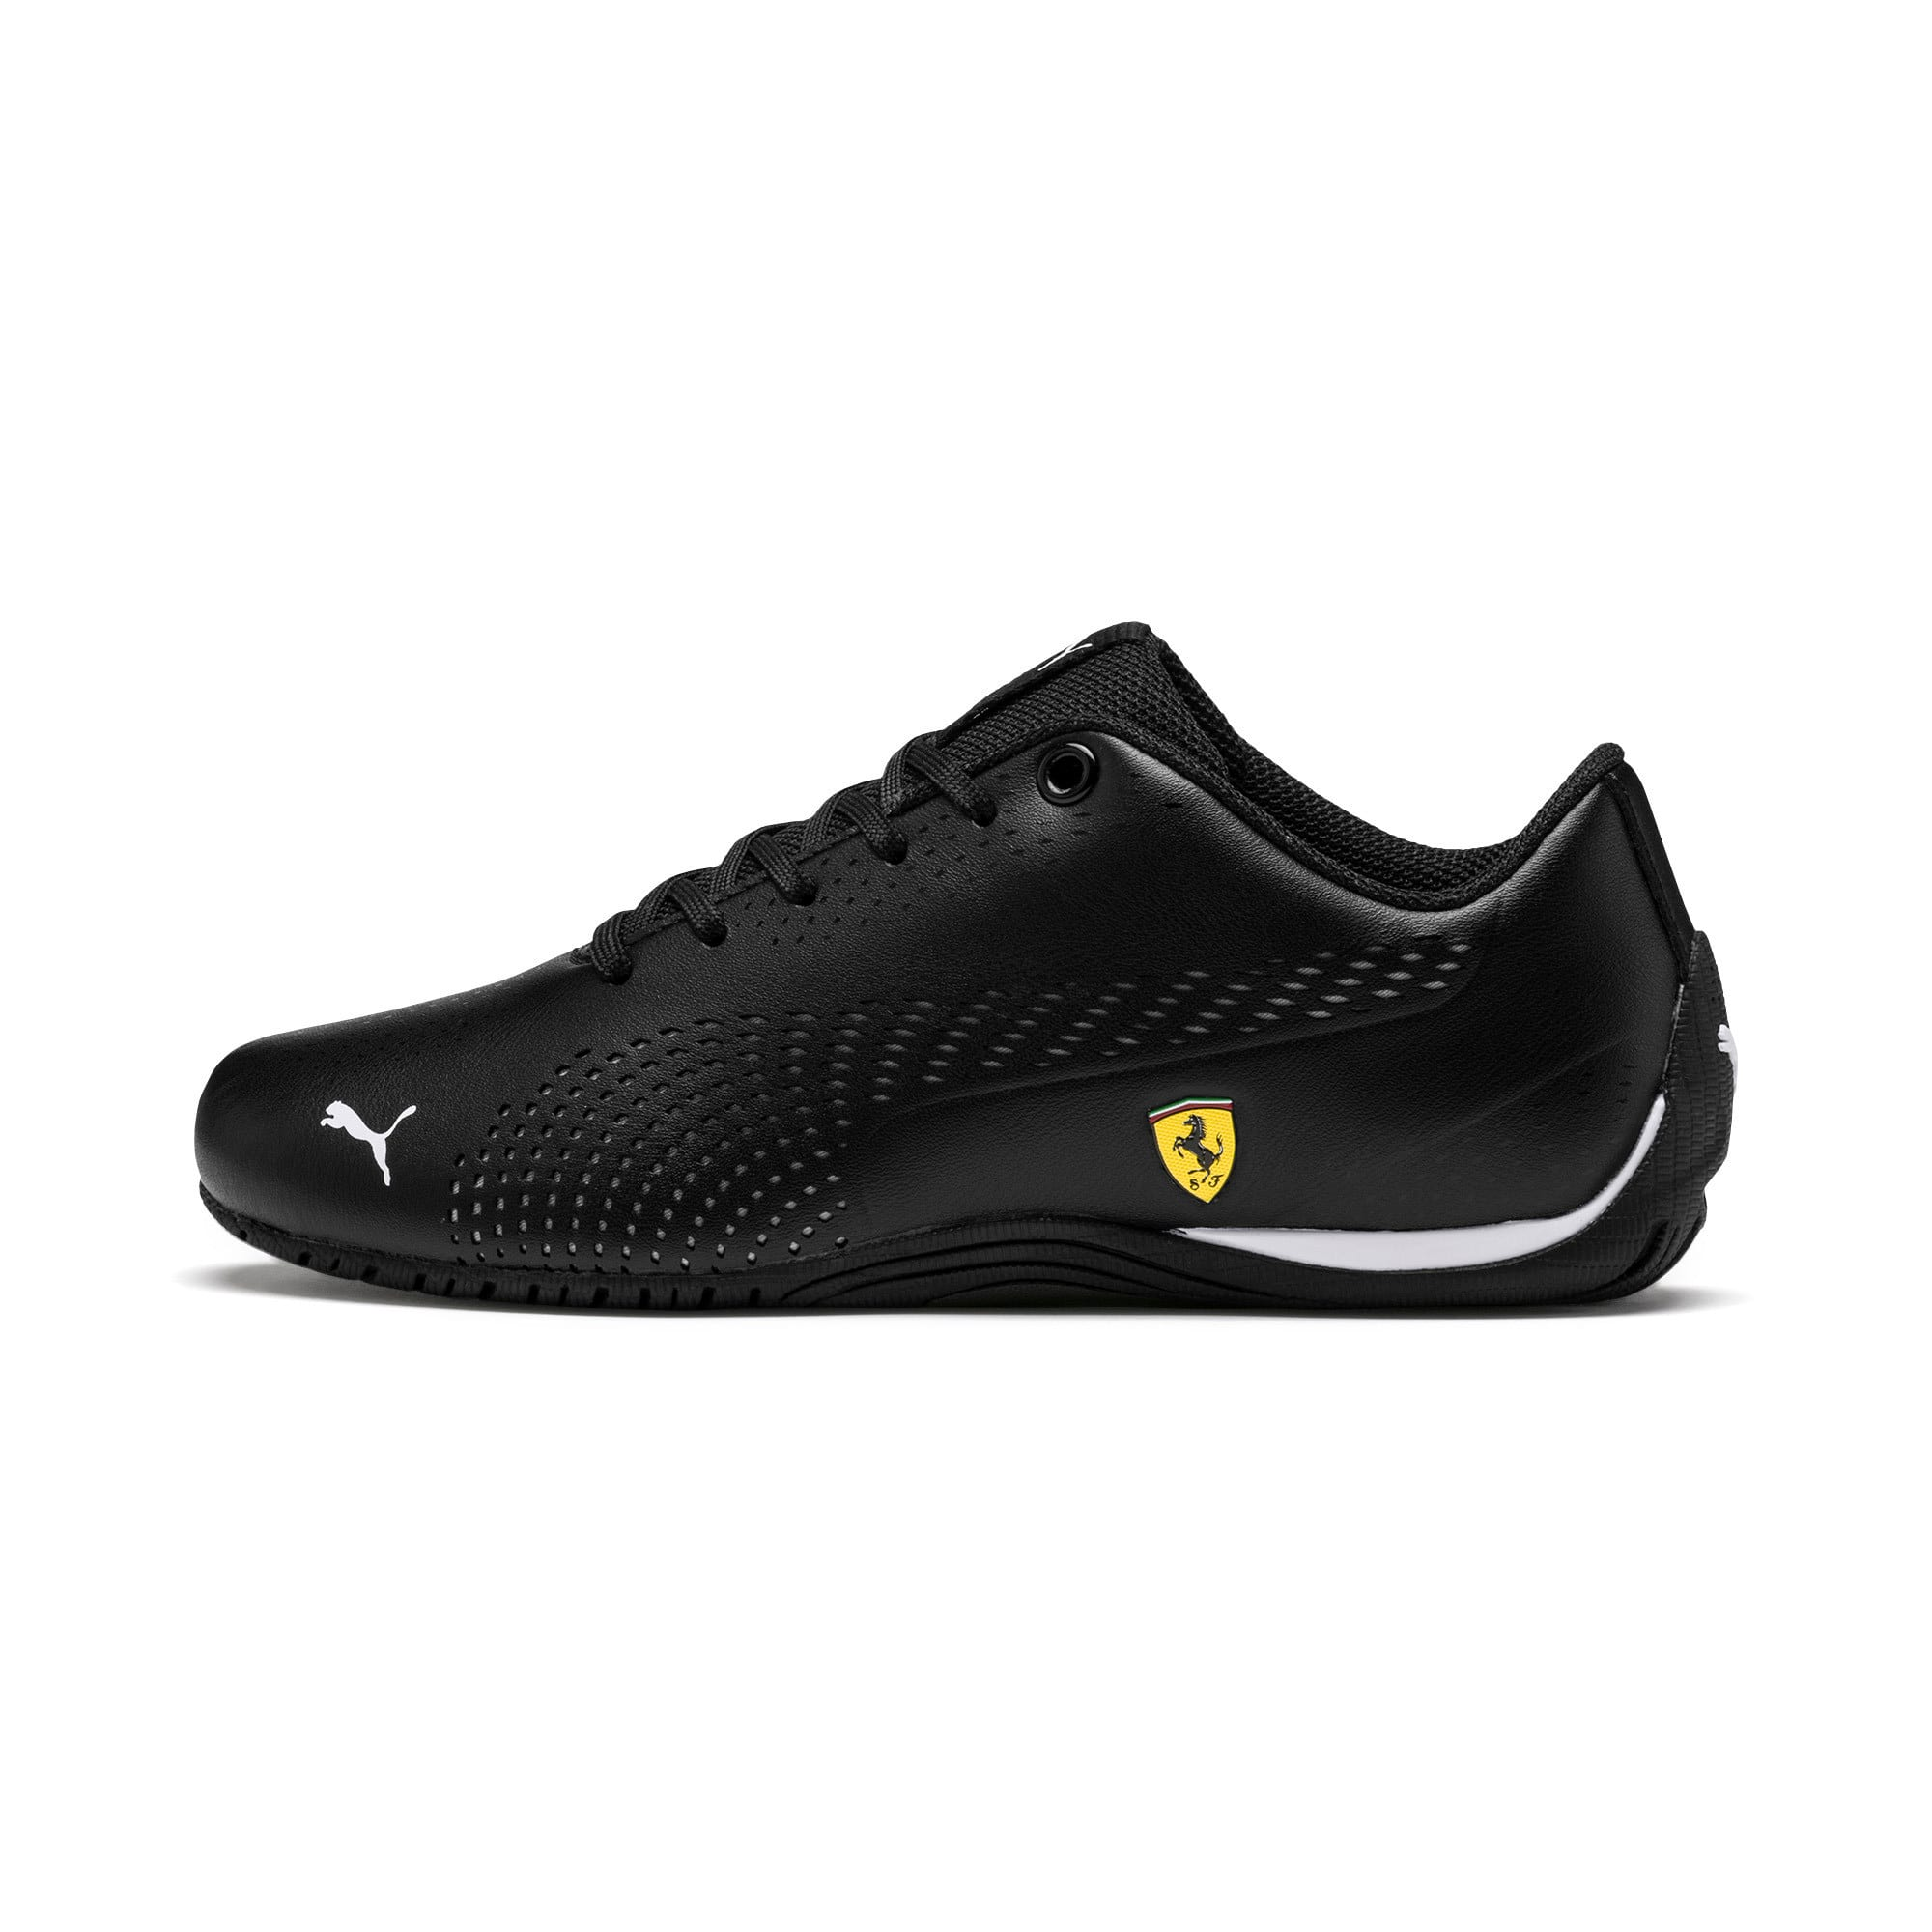 Thumbnail 1 of Ferrari Drift Cat 5 Ultra II Youth Sneaker, Puma Black-Puma White, medium